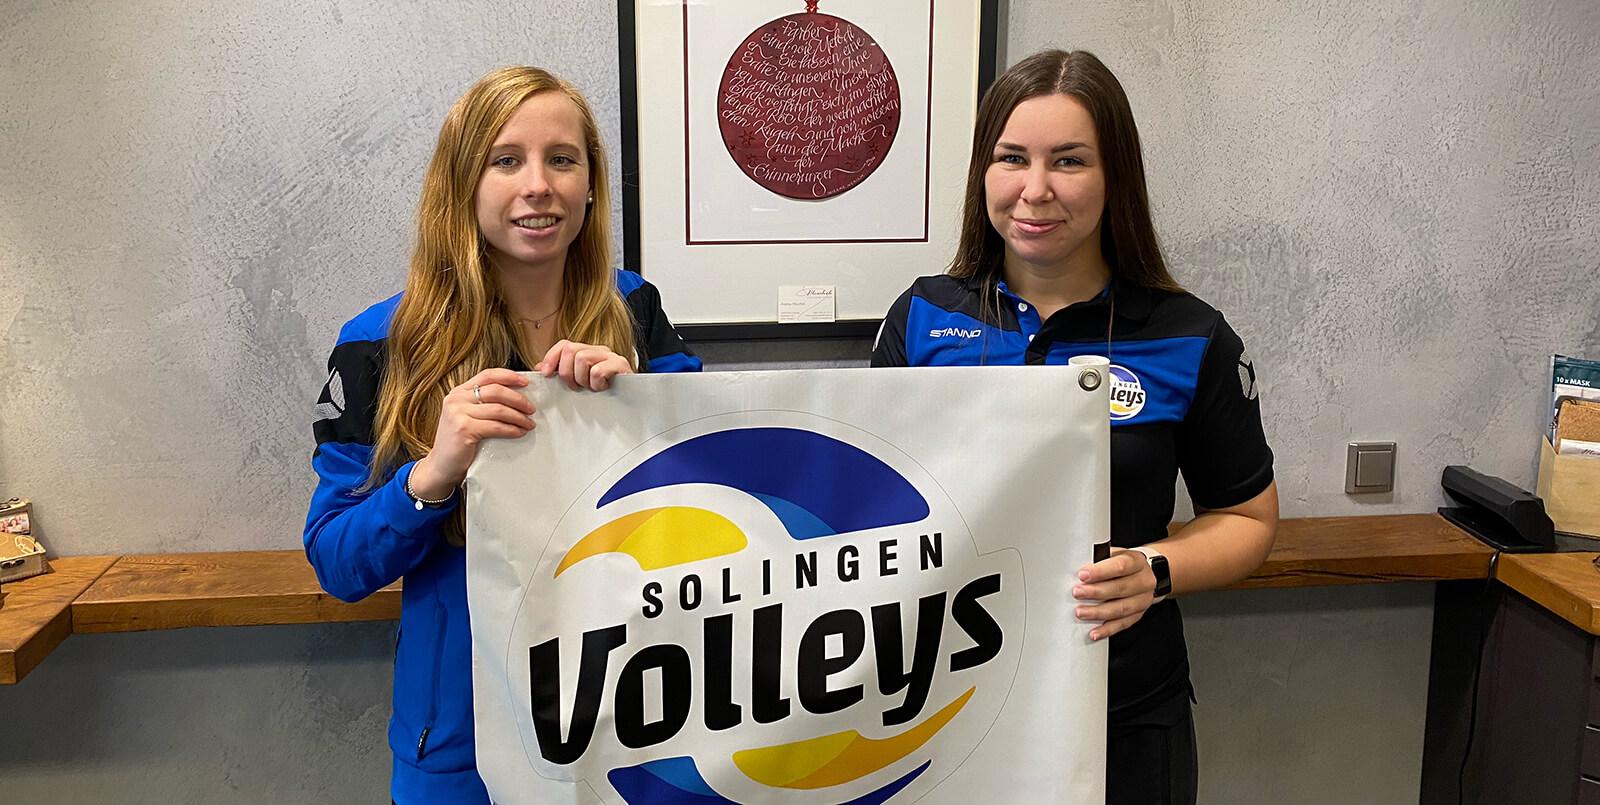 SolingenVolleys e.V.: Mira Augustin und Kim Grawunder